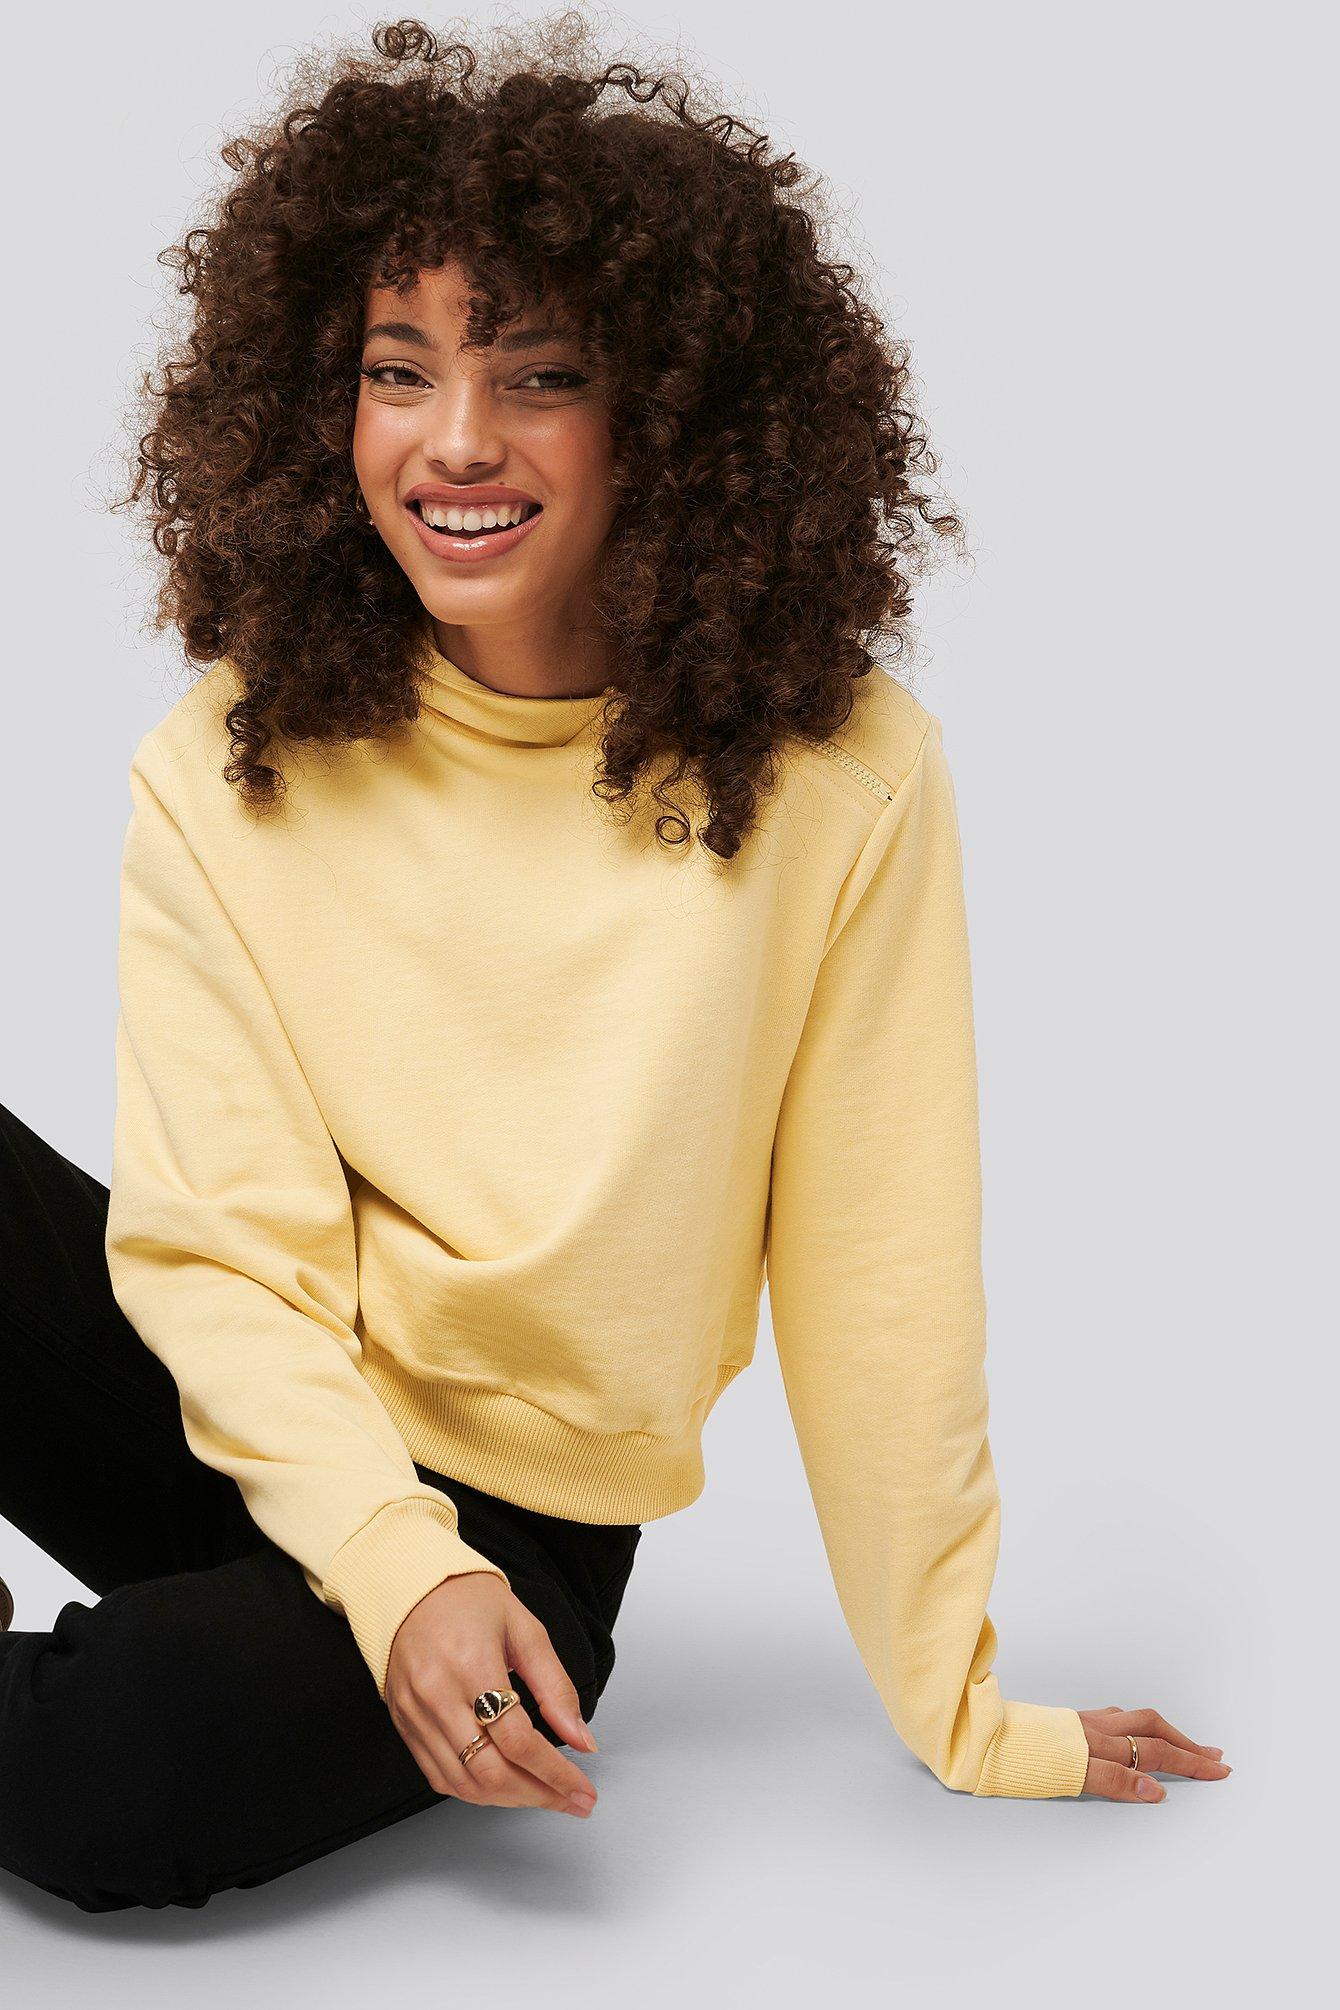 NA-KD Kurzer Kapuzenpulli Asymmetrischer Reißverschluss - Yellow | Bekleidung > Pullover > Kapuzenpullover | NA-KD